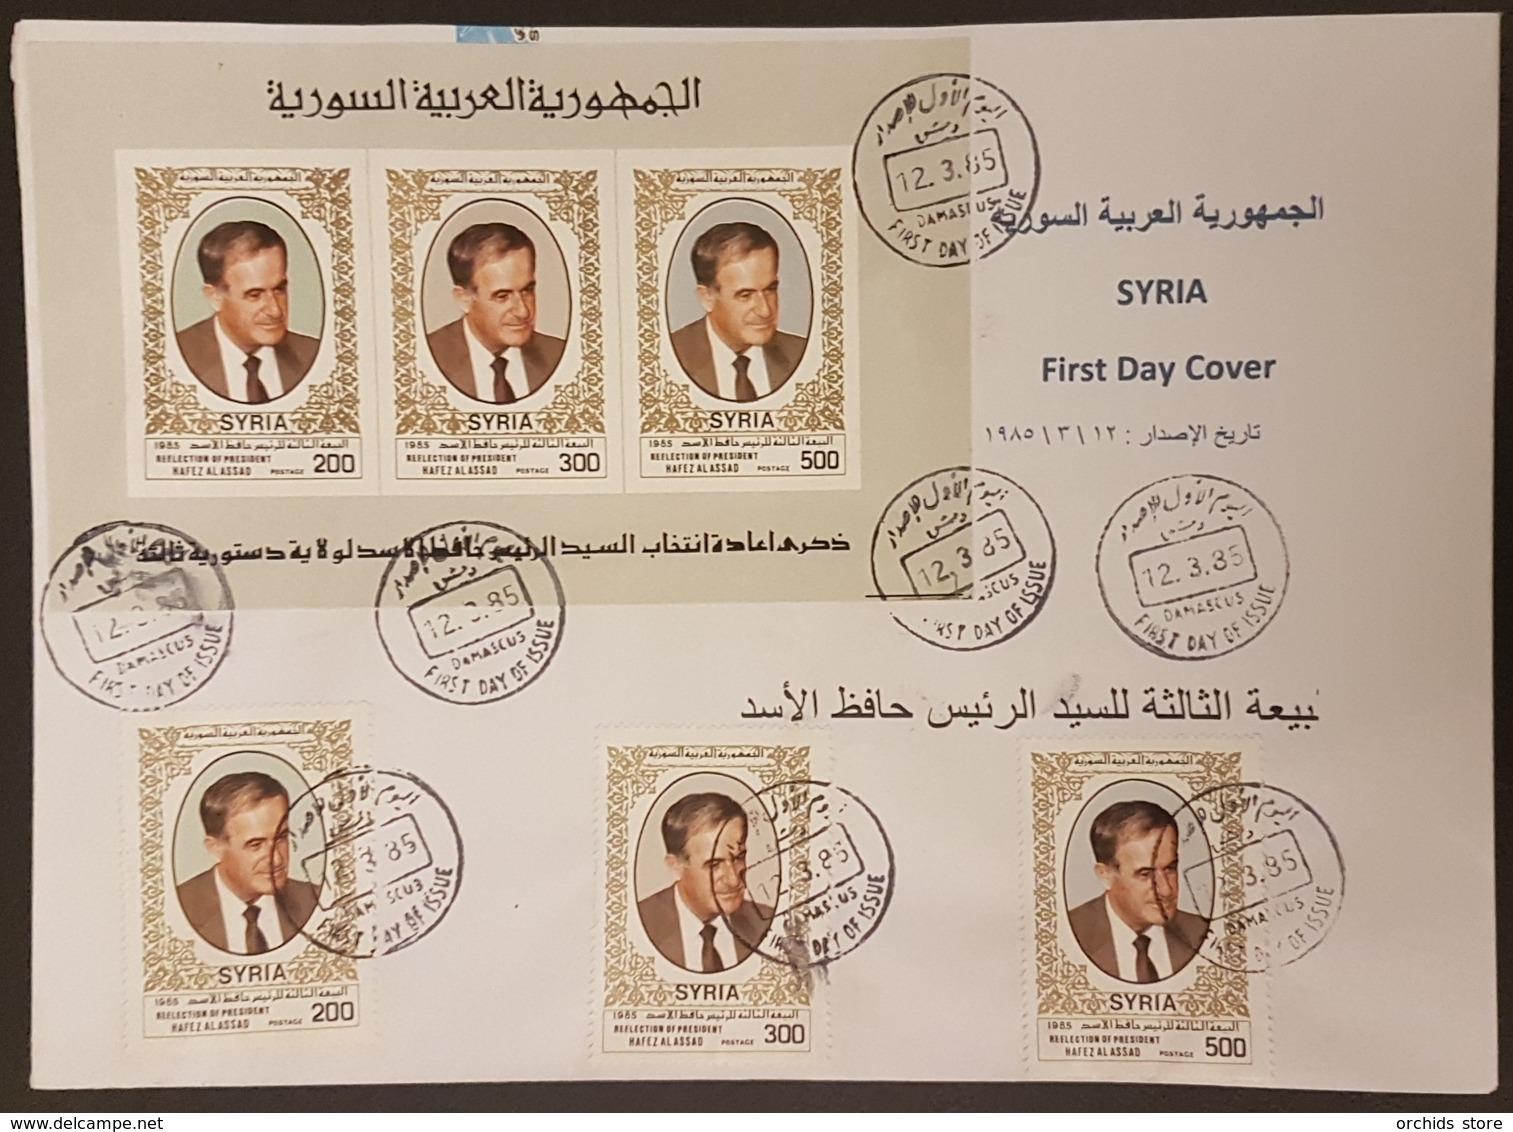 Syria 1985 FDC - 3d Election Of President Assad - Syrië